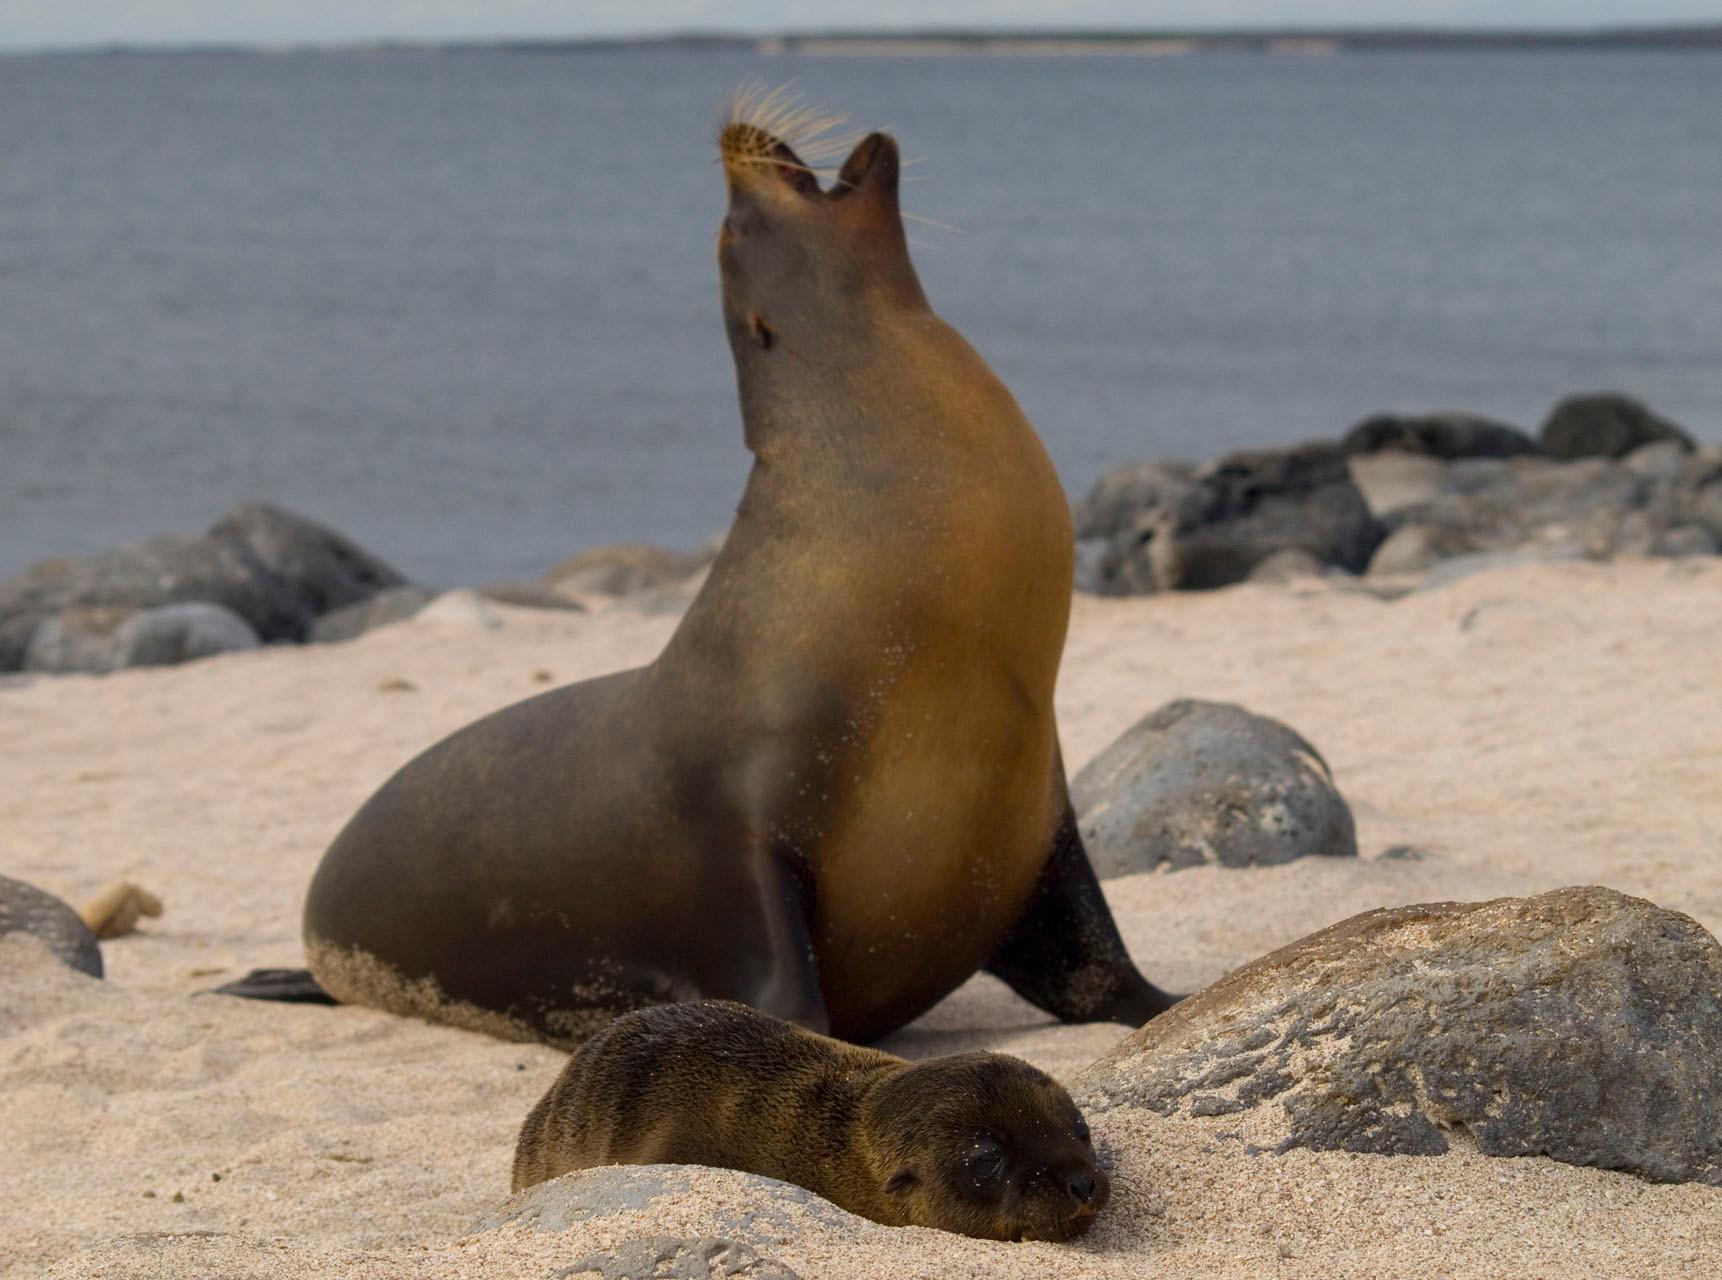 Sea Lions [Galapagos, Ecudor, 2009]